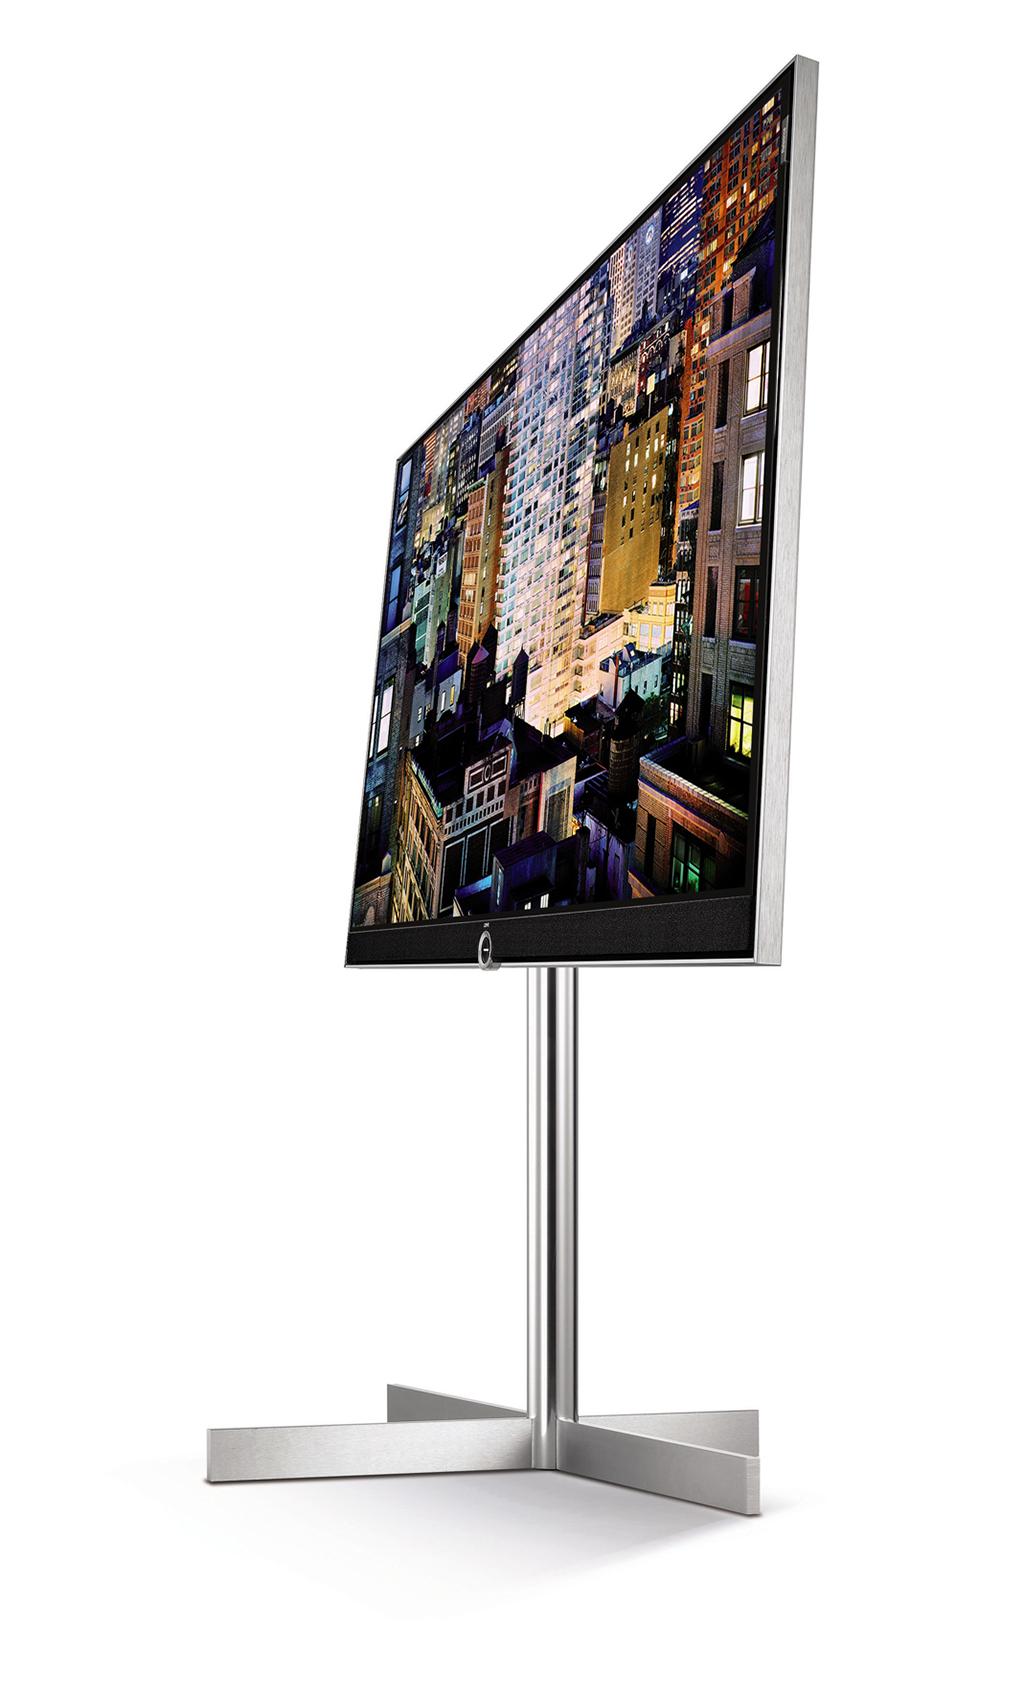 loewe reference 55 con pantalla ultra hd y un ptimo sonido. Black Bedroom Furniture Sets. Home Design Ideas